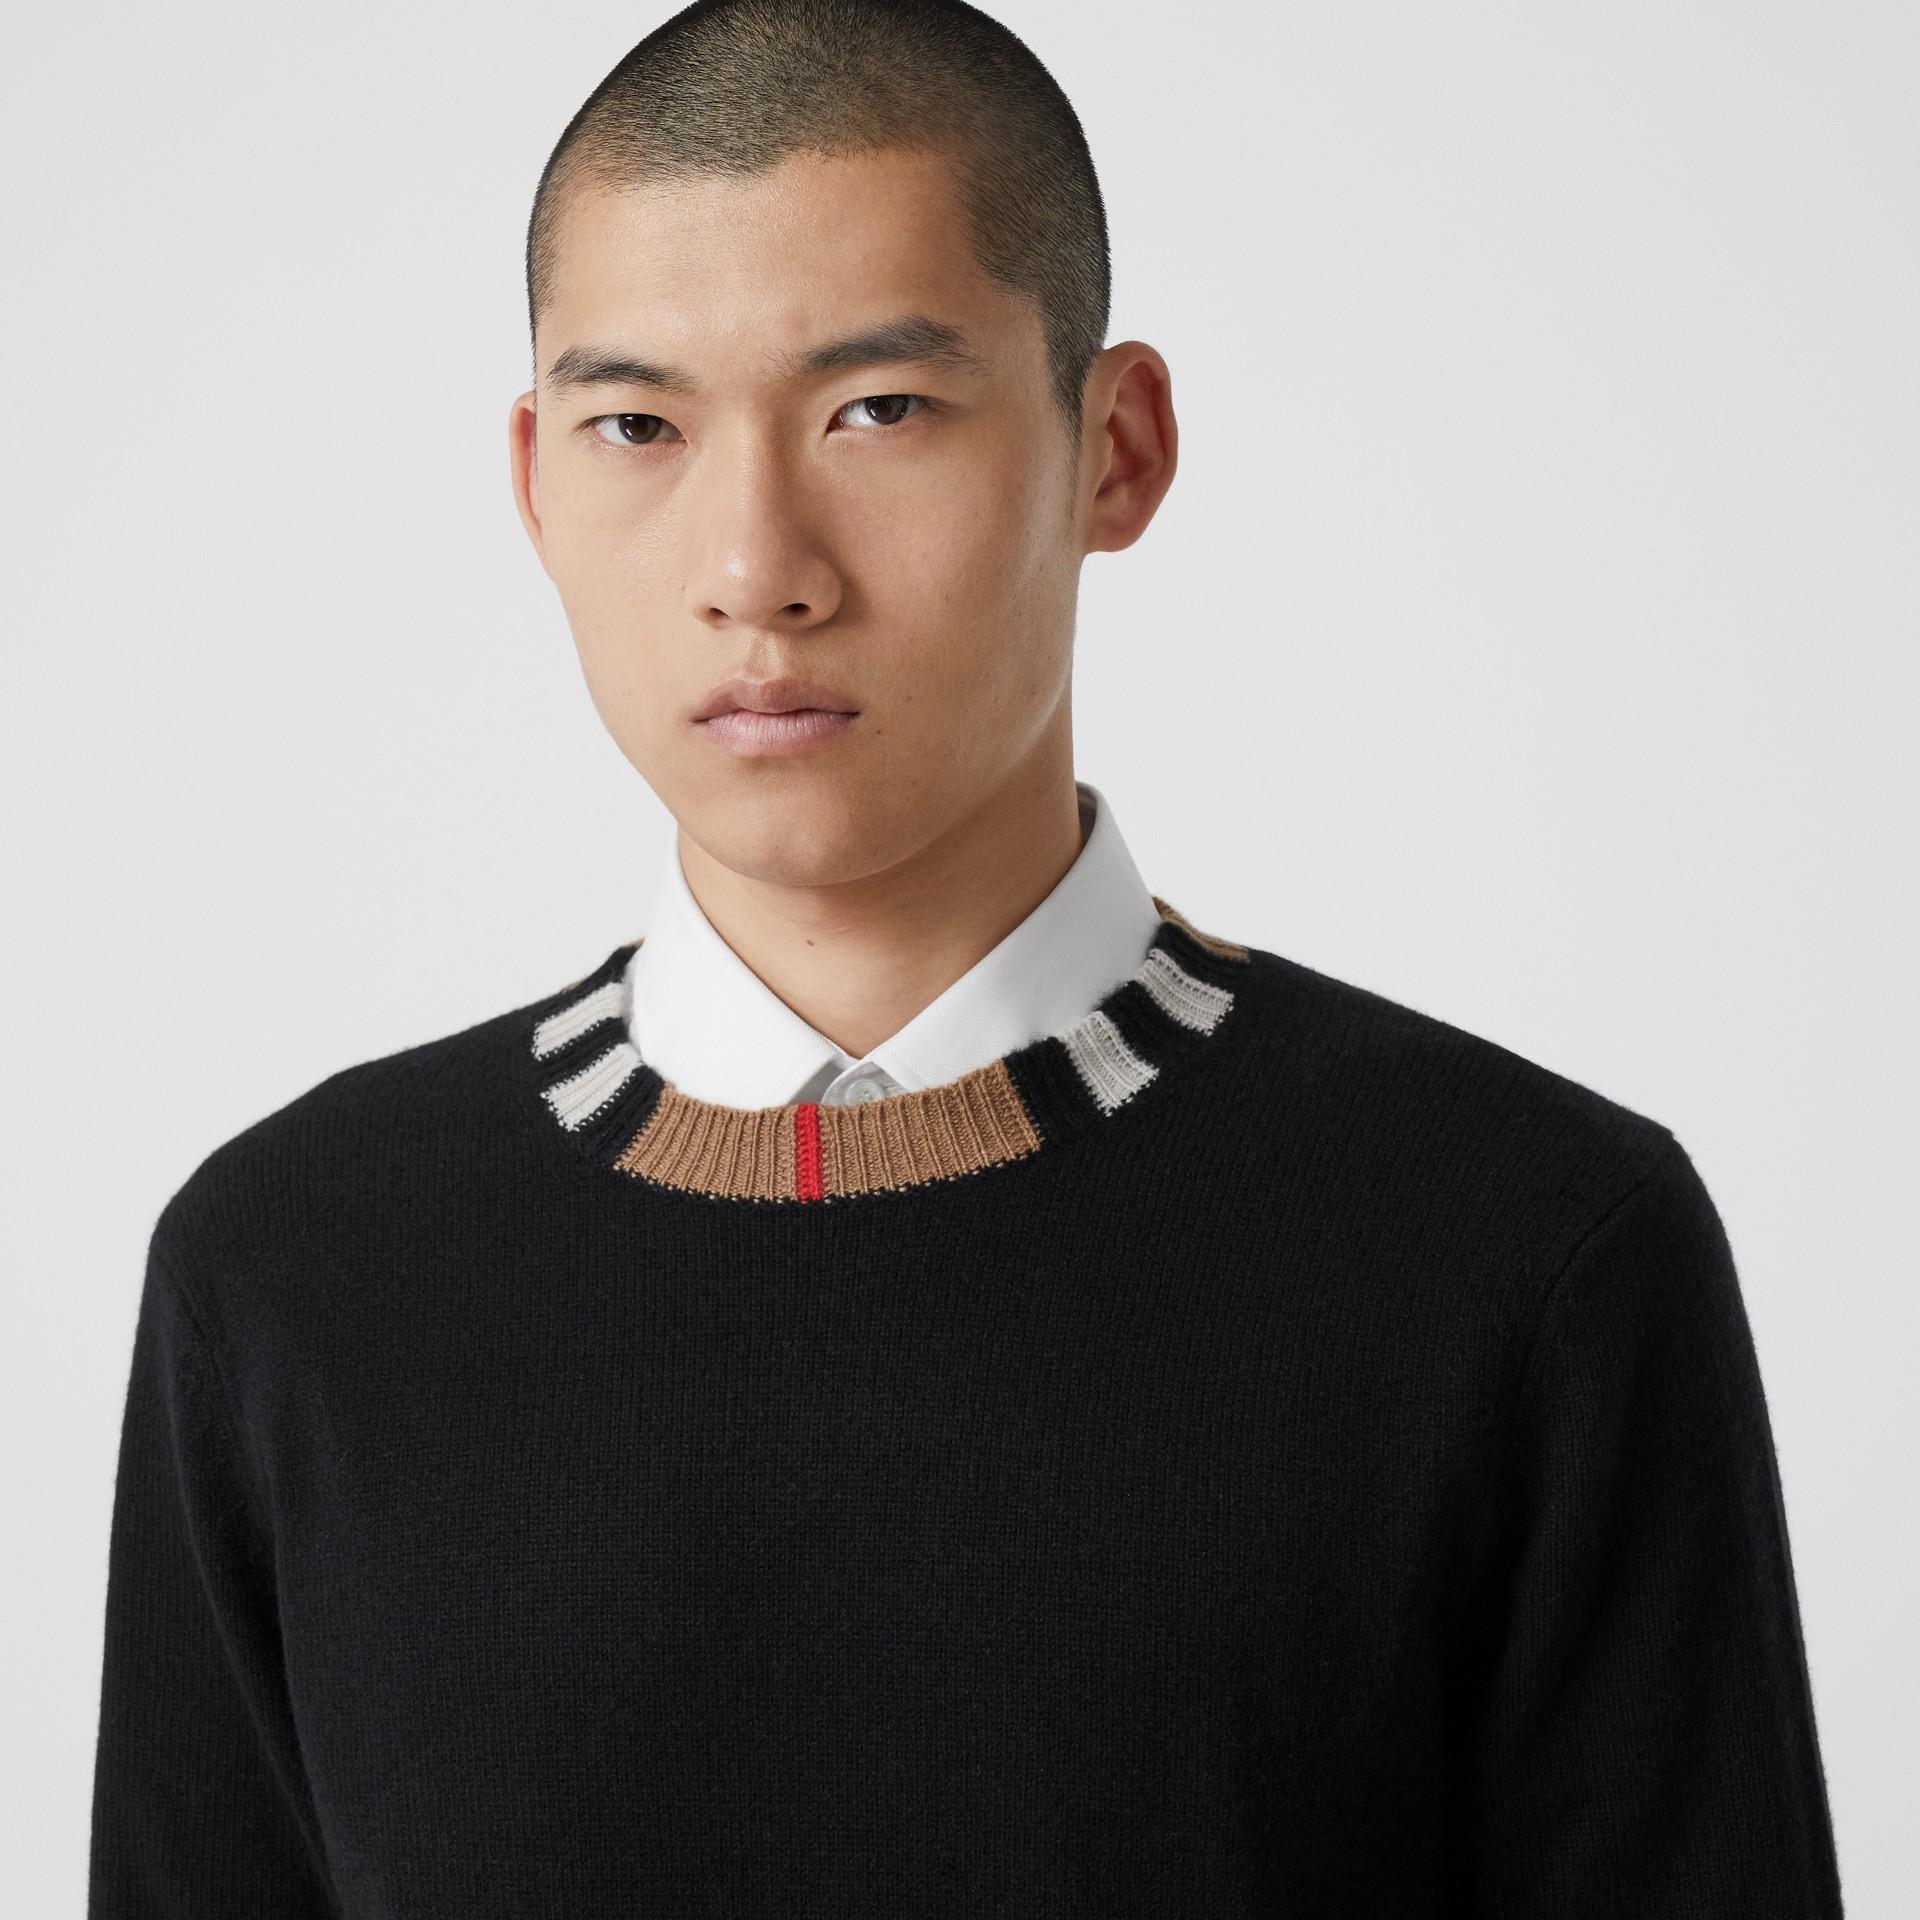 Icon Stripe Trim Cashmere Sweater in Black - Men | Burberry - gallery image 1